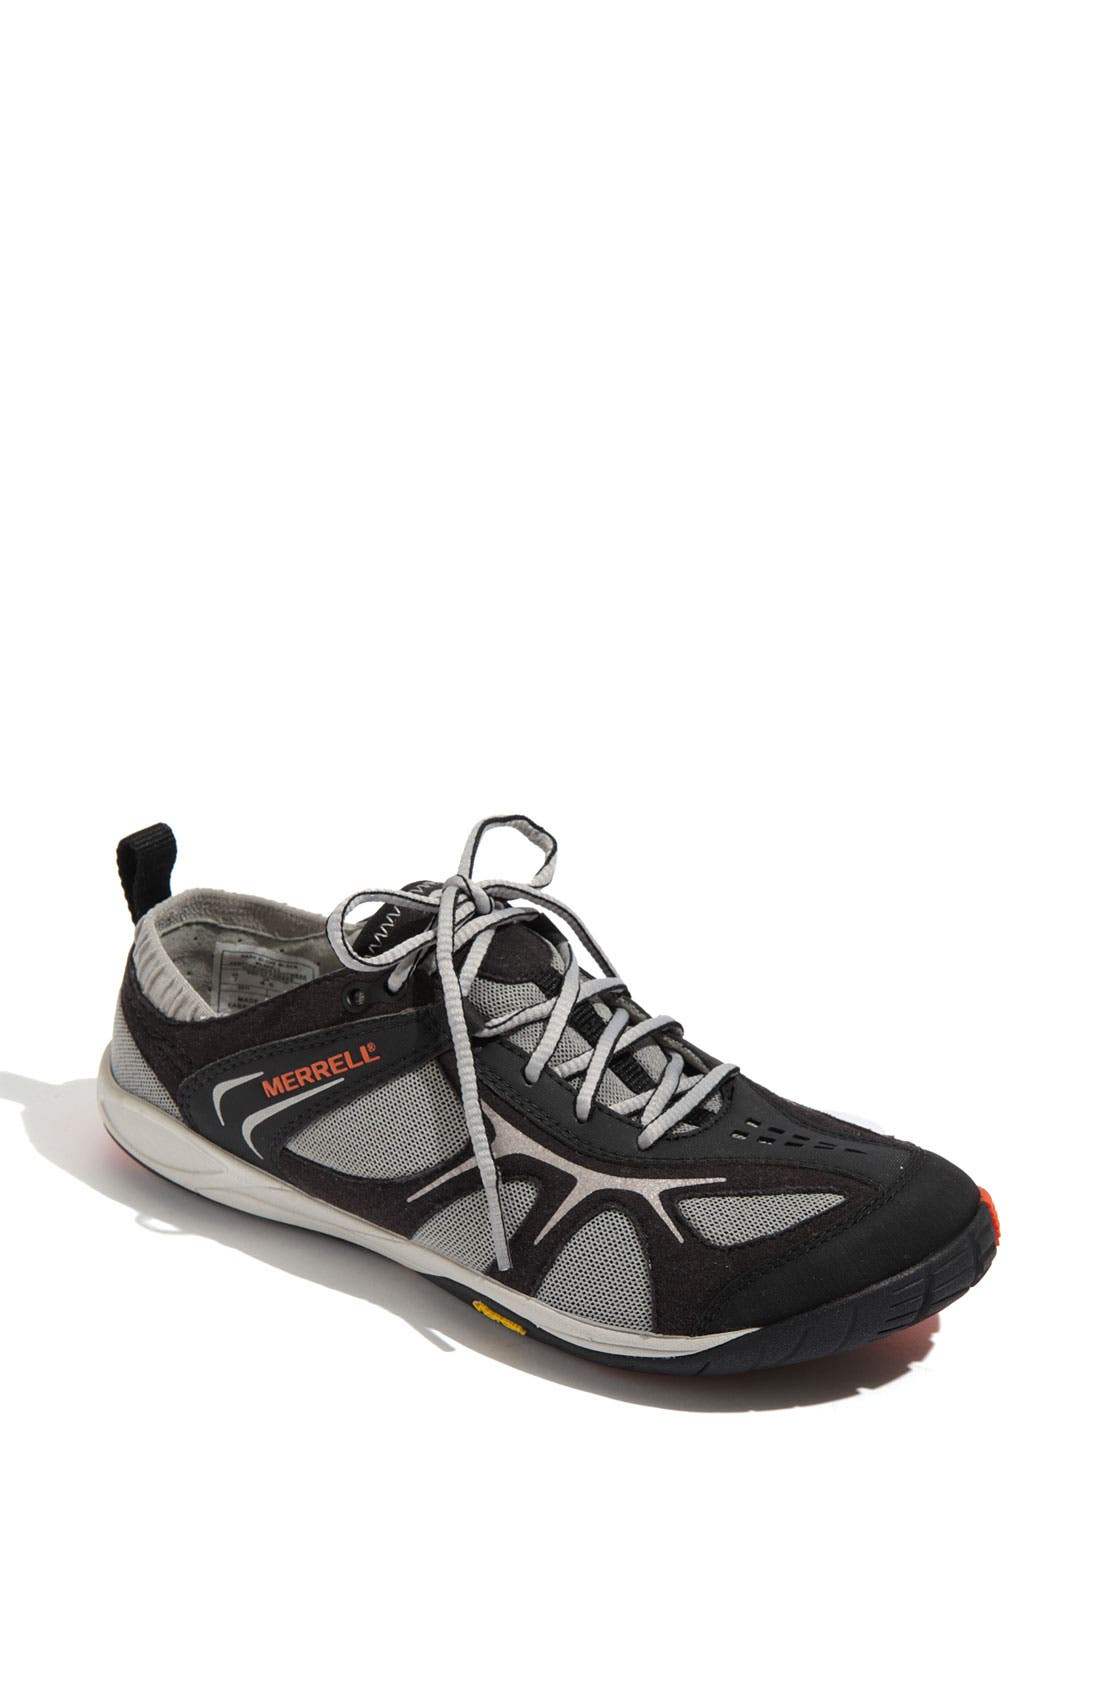 Alternate Image 1 Selected - Merrell 'Dash Glove' Running Shoe (Women)